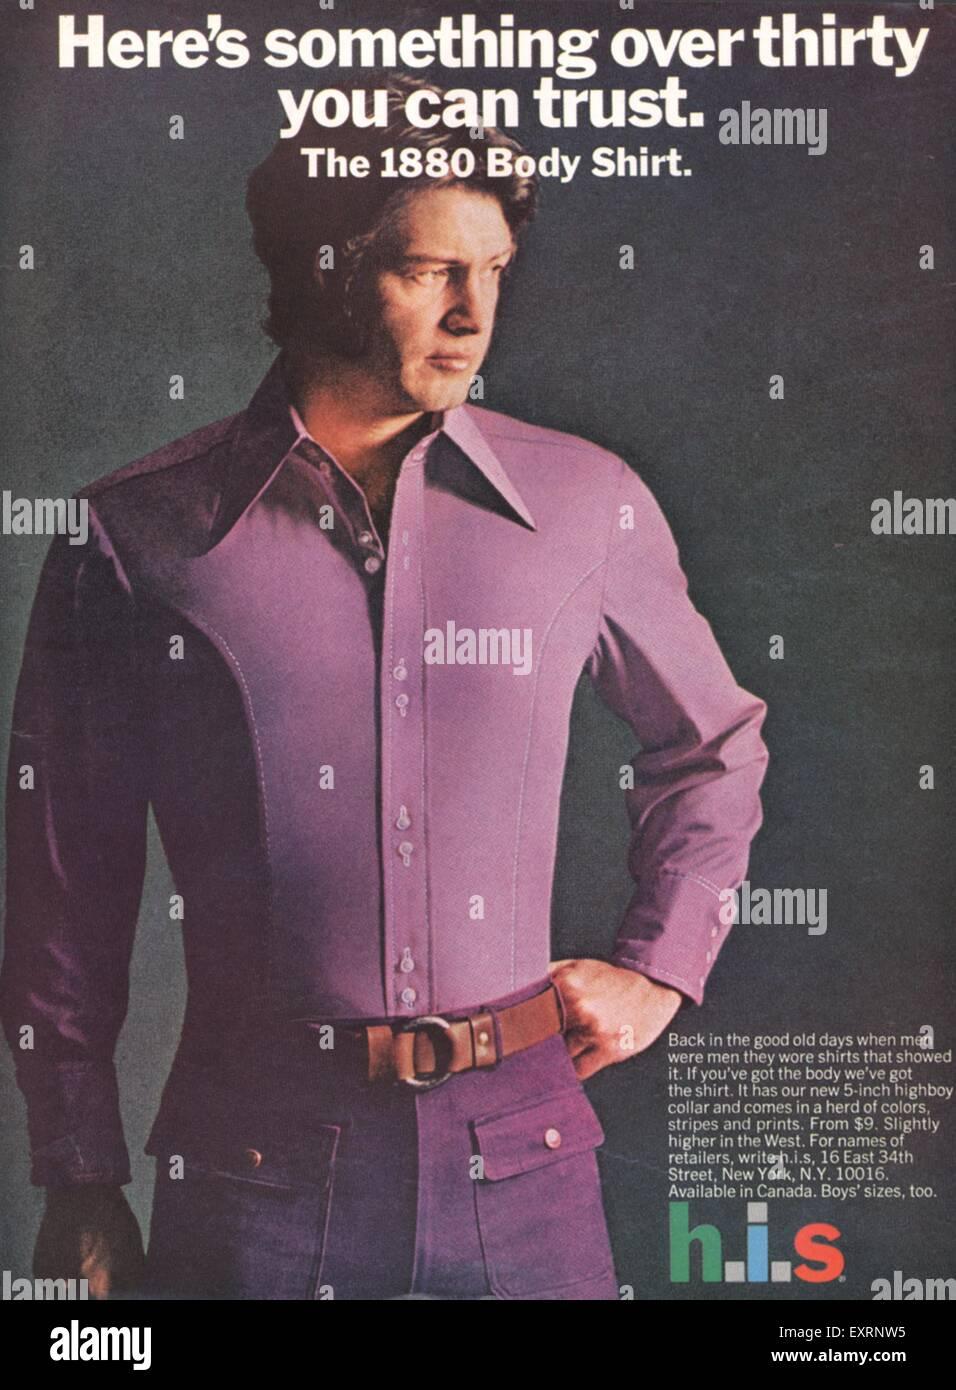 1970s UK his Magazine Advert - Stock Image